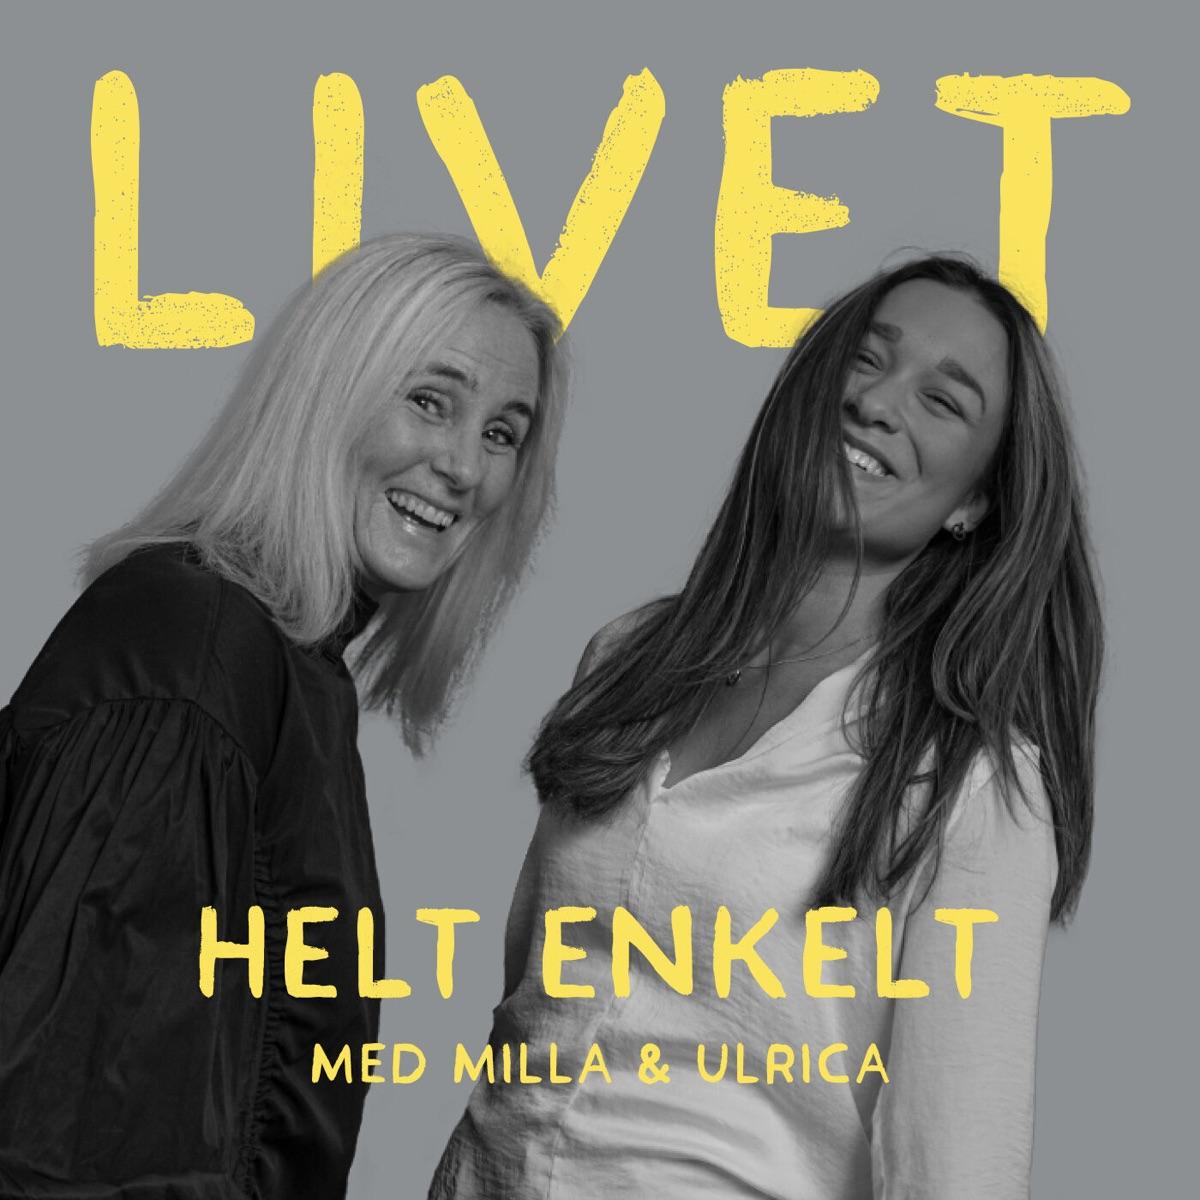 Livet helt enkelt med Milla & Ulrica